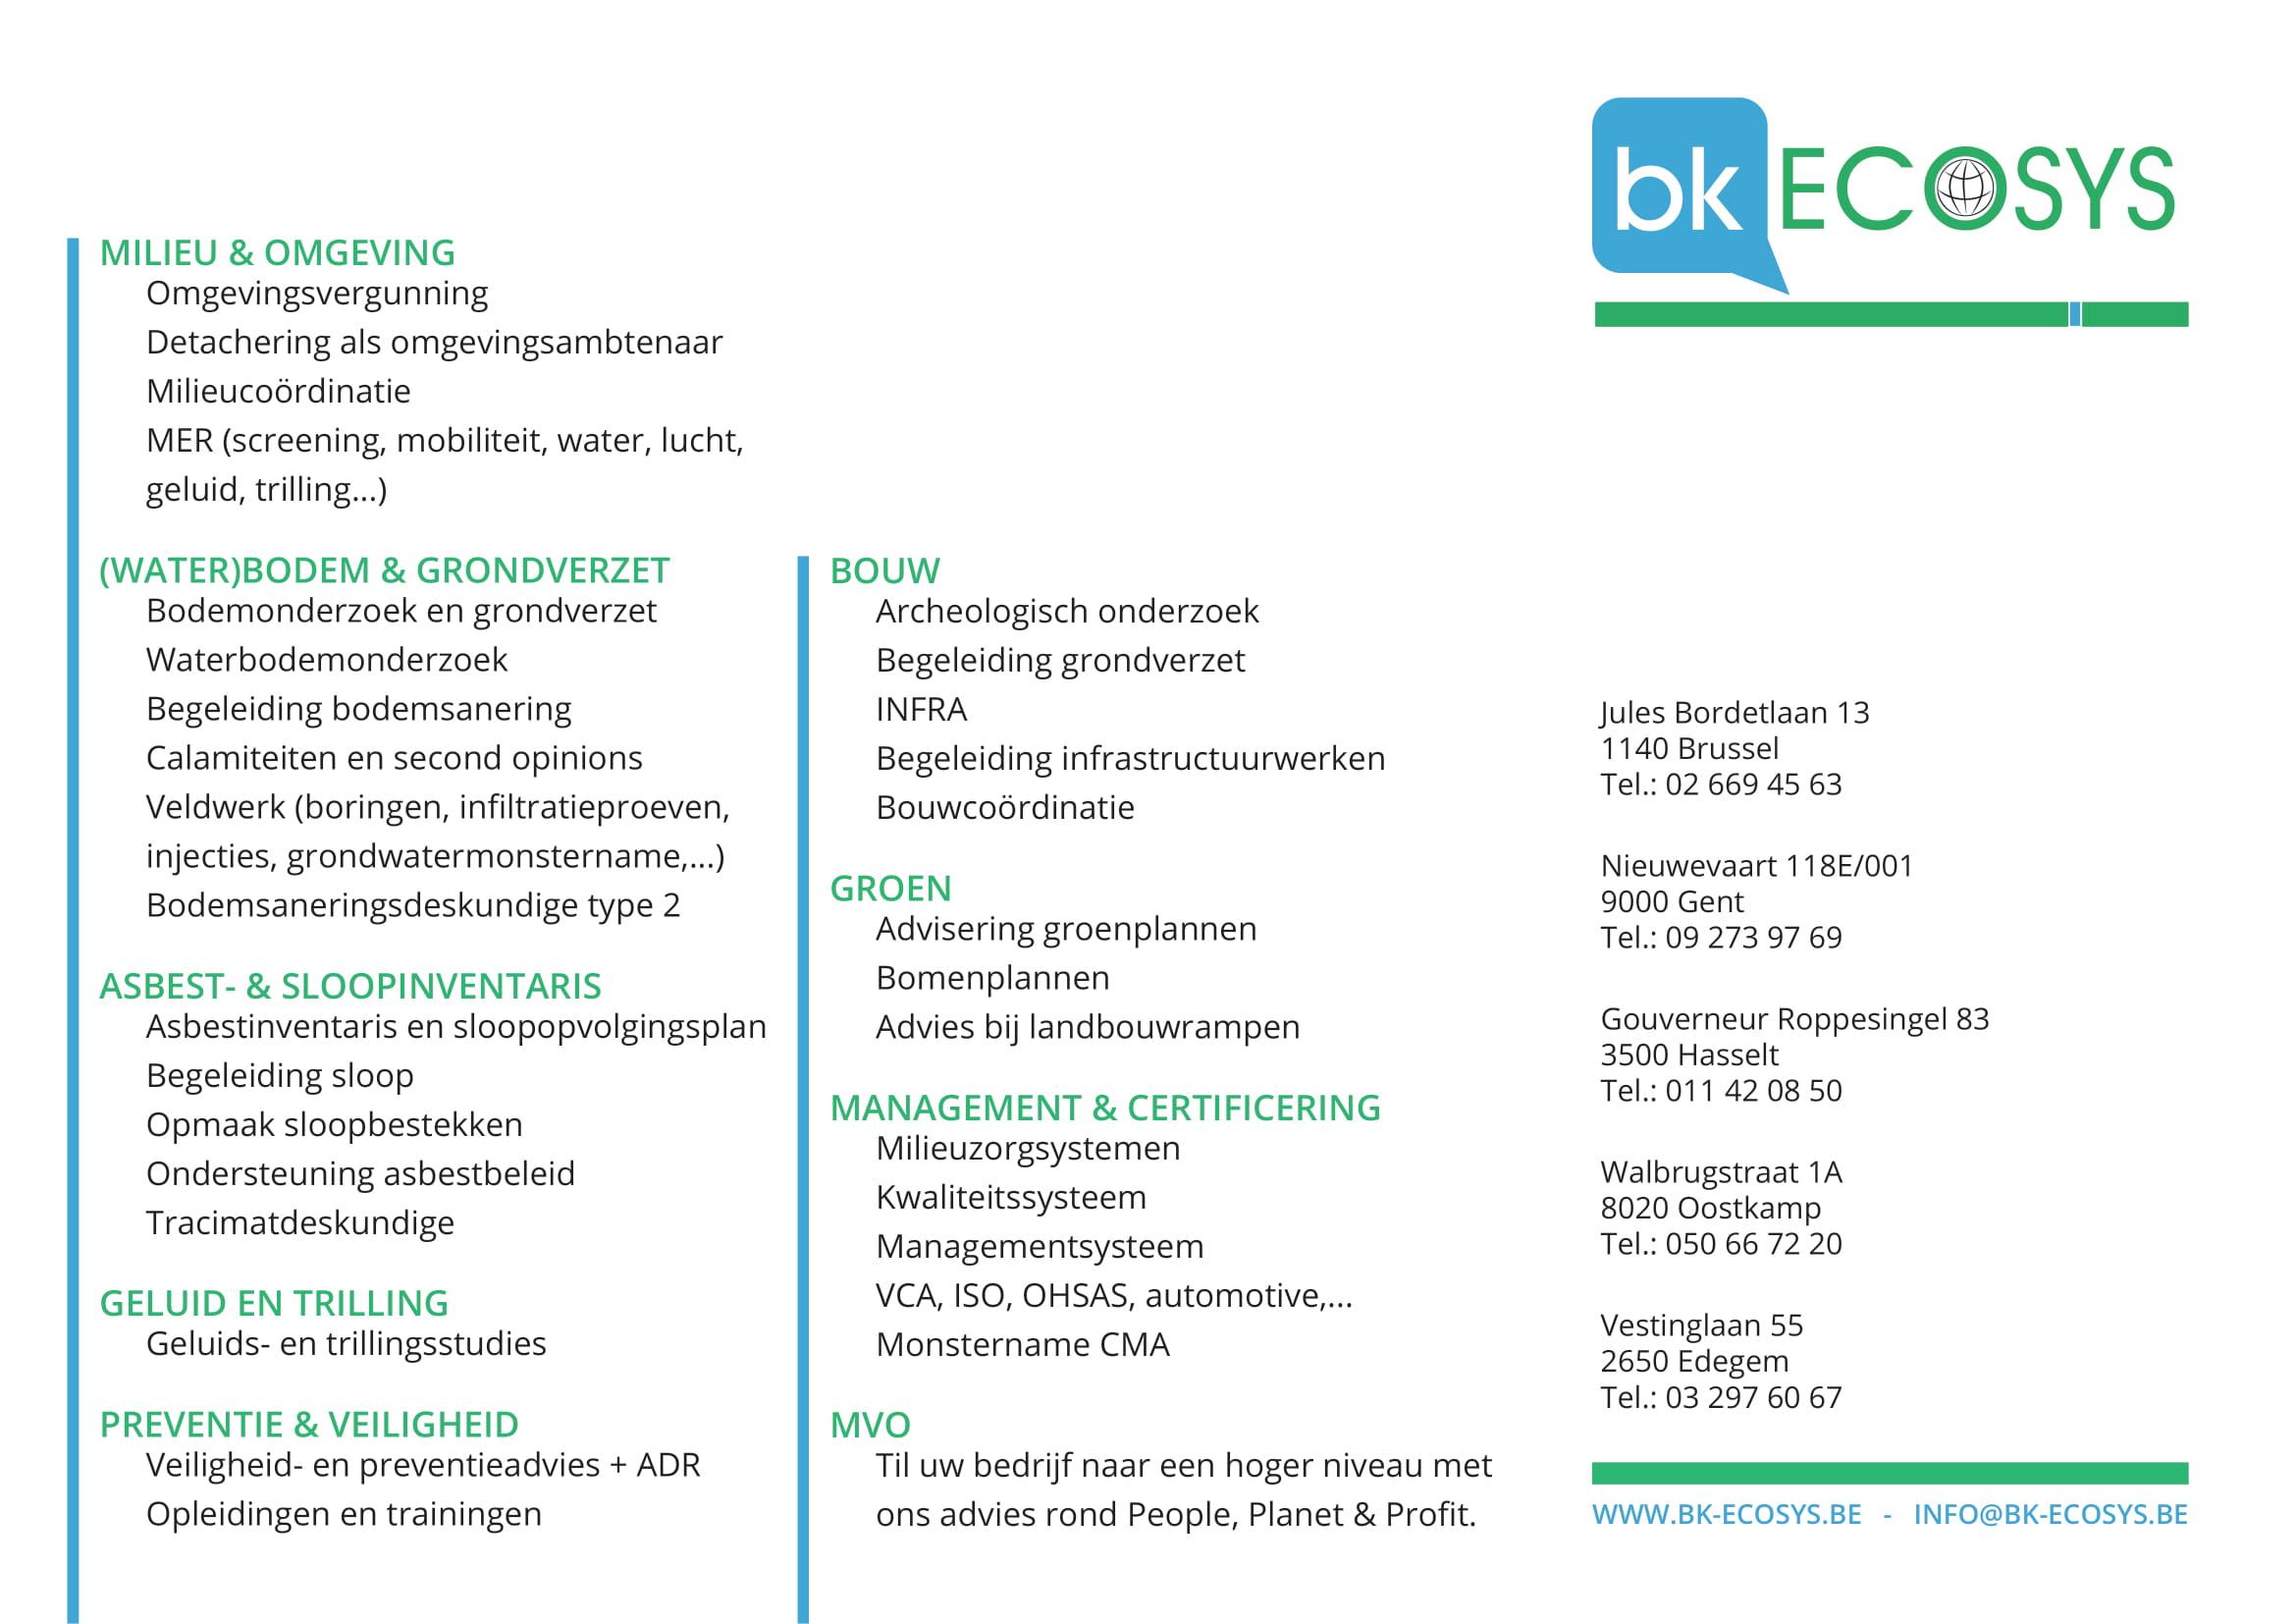 BK Ecosys asbestinventaris en sloopinventaris